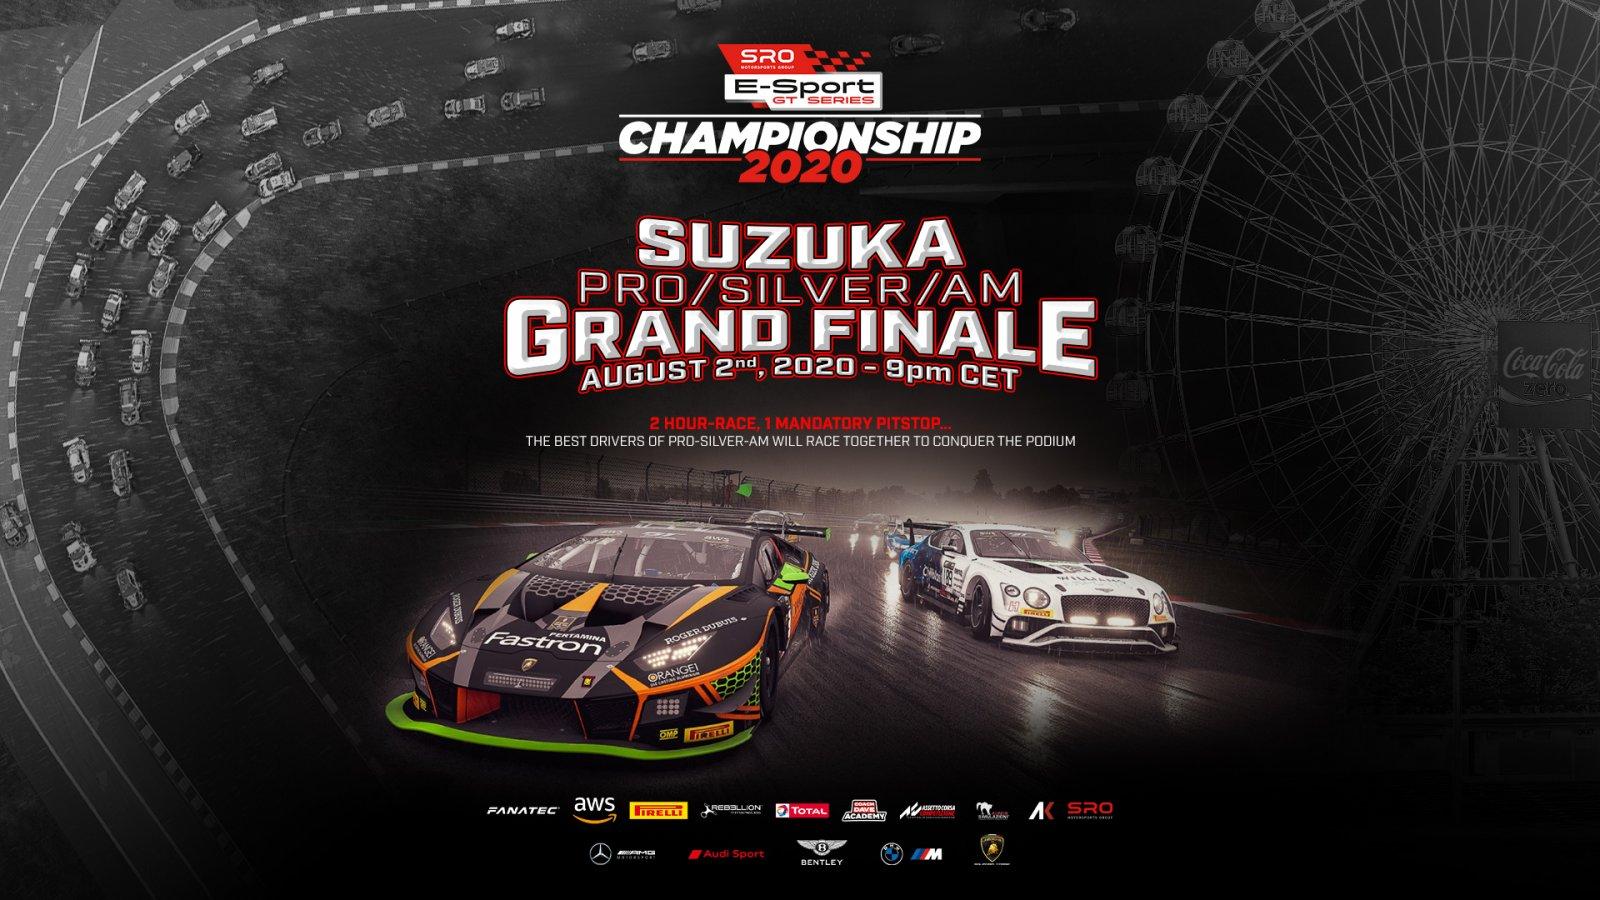 SRO E-Sport GT Series set for winner-takes-all finale at Suzuka